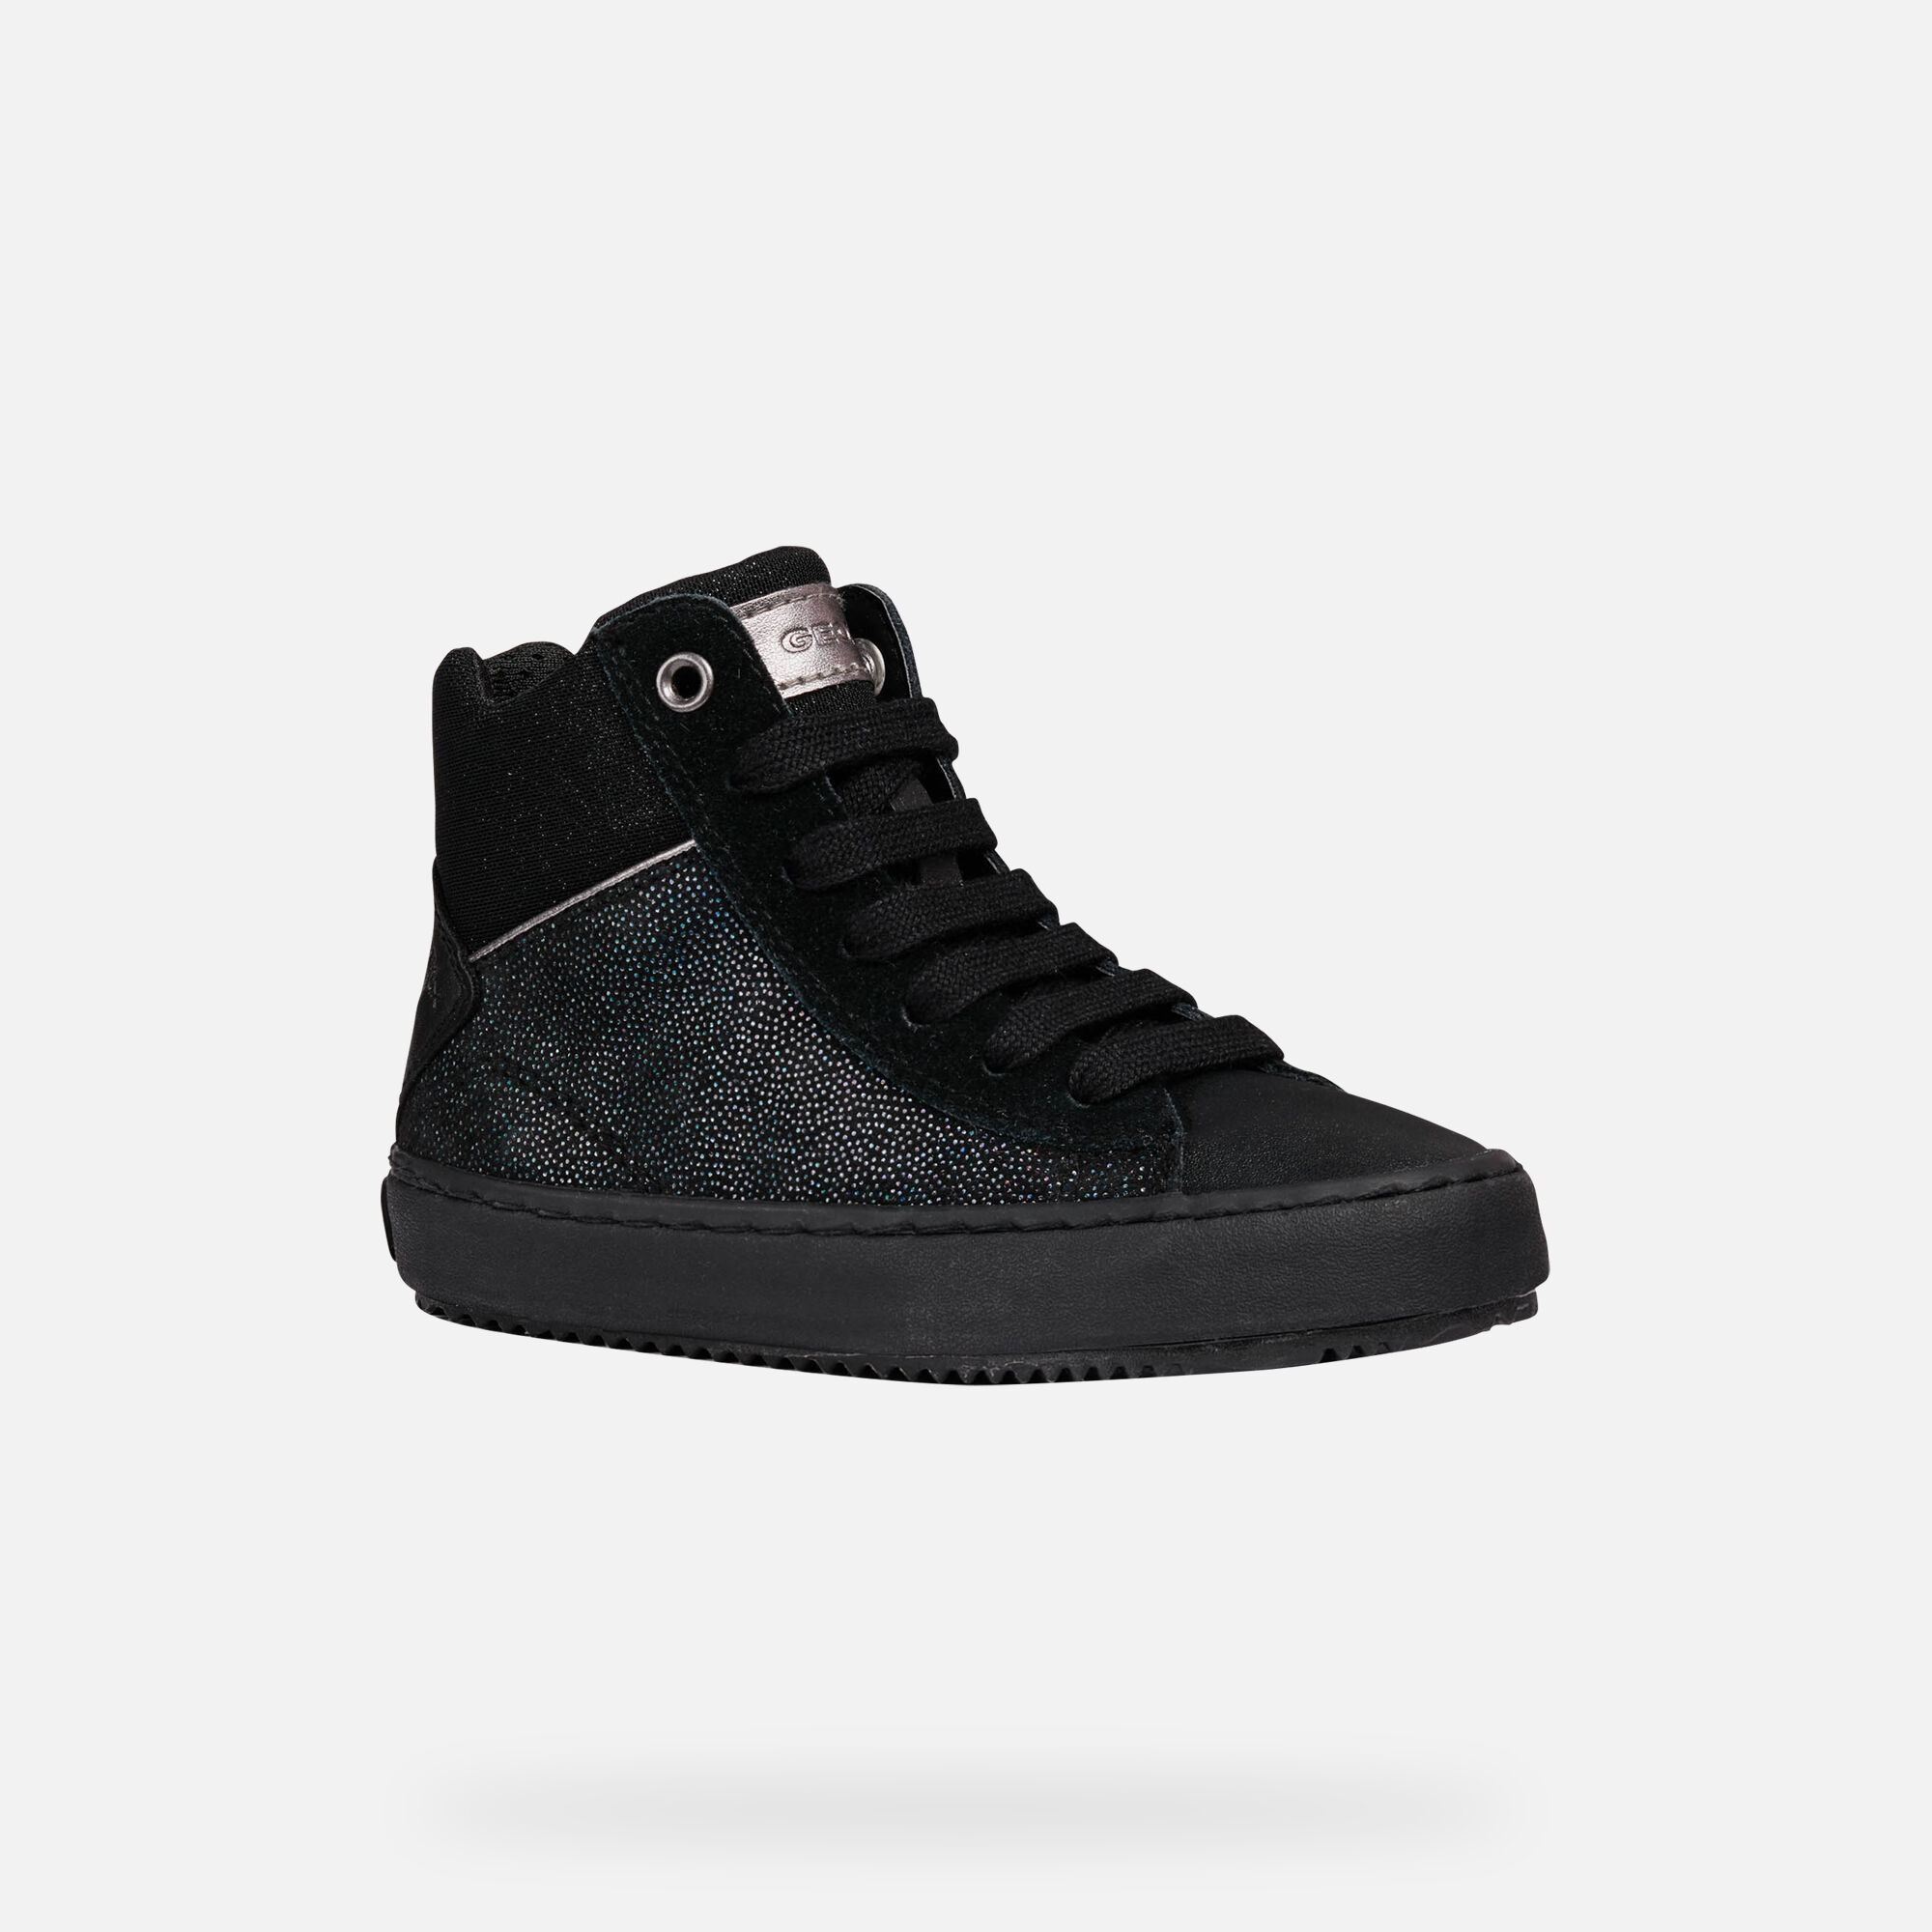 Geox Jr Kalispera Zip Up Kid's Shoes | Country Attire